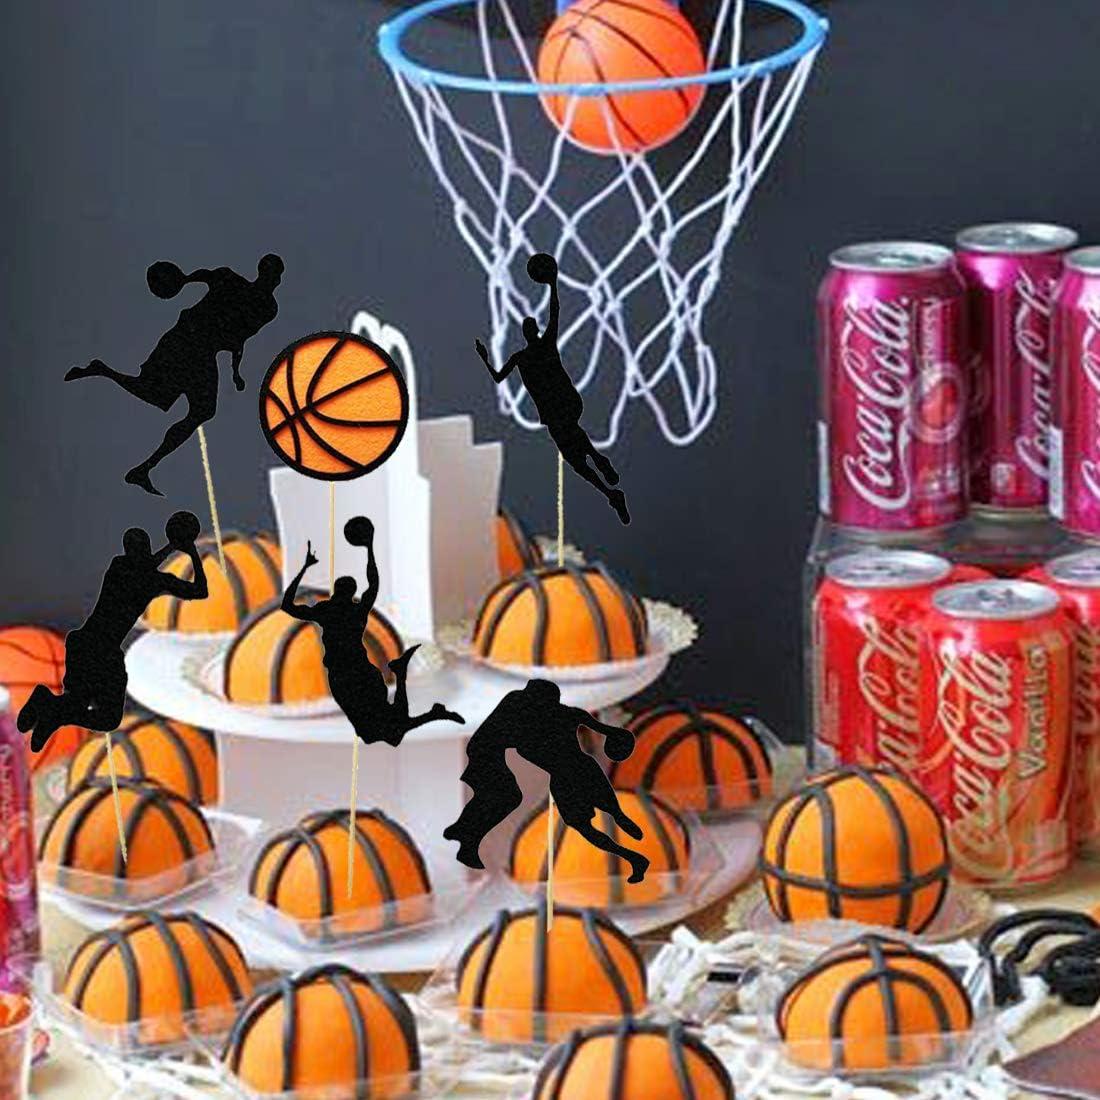 JOYMEMO Suministros para la Fiesta de Baloncesto Baloncesto ...